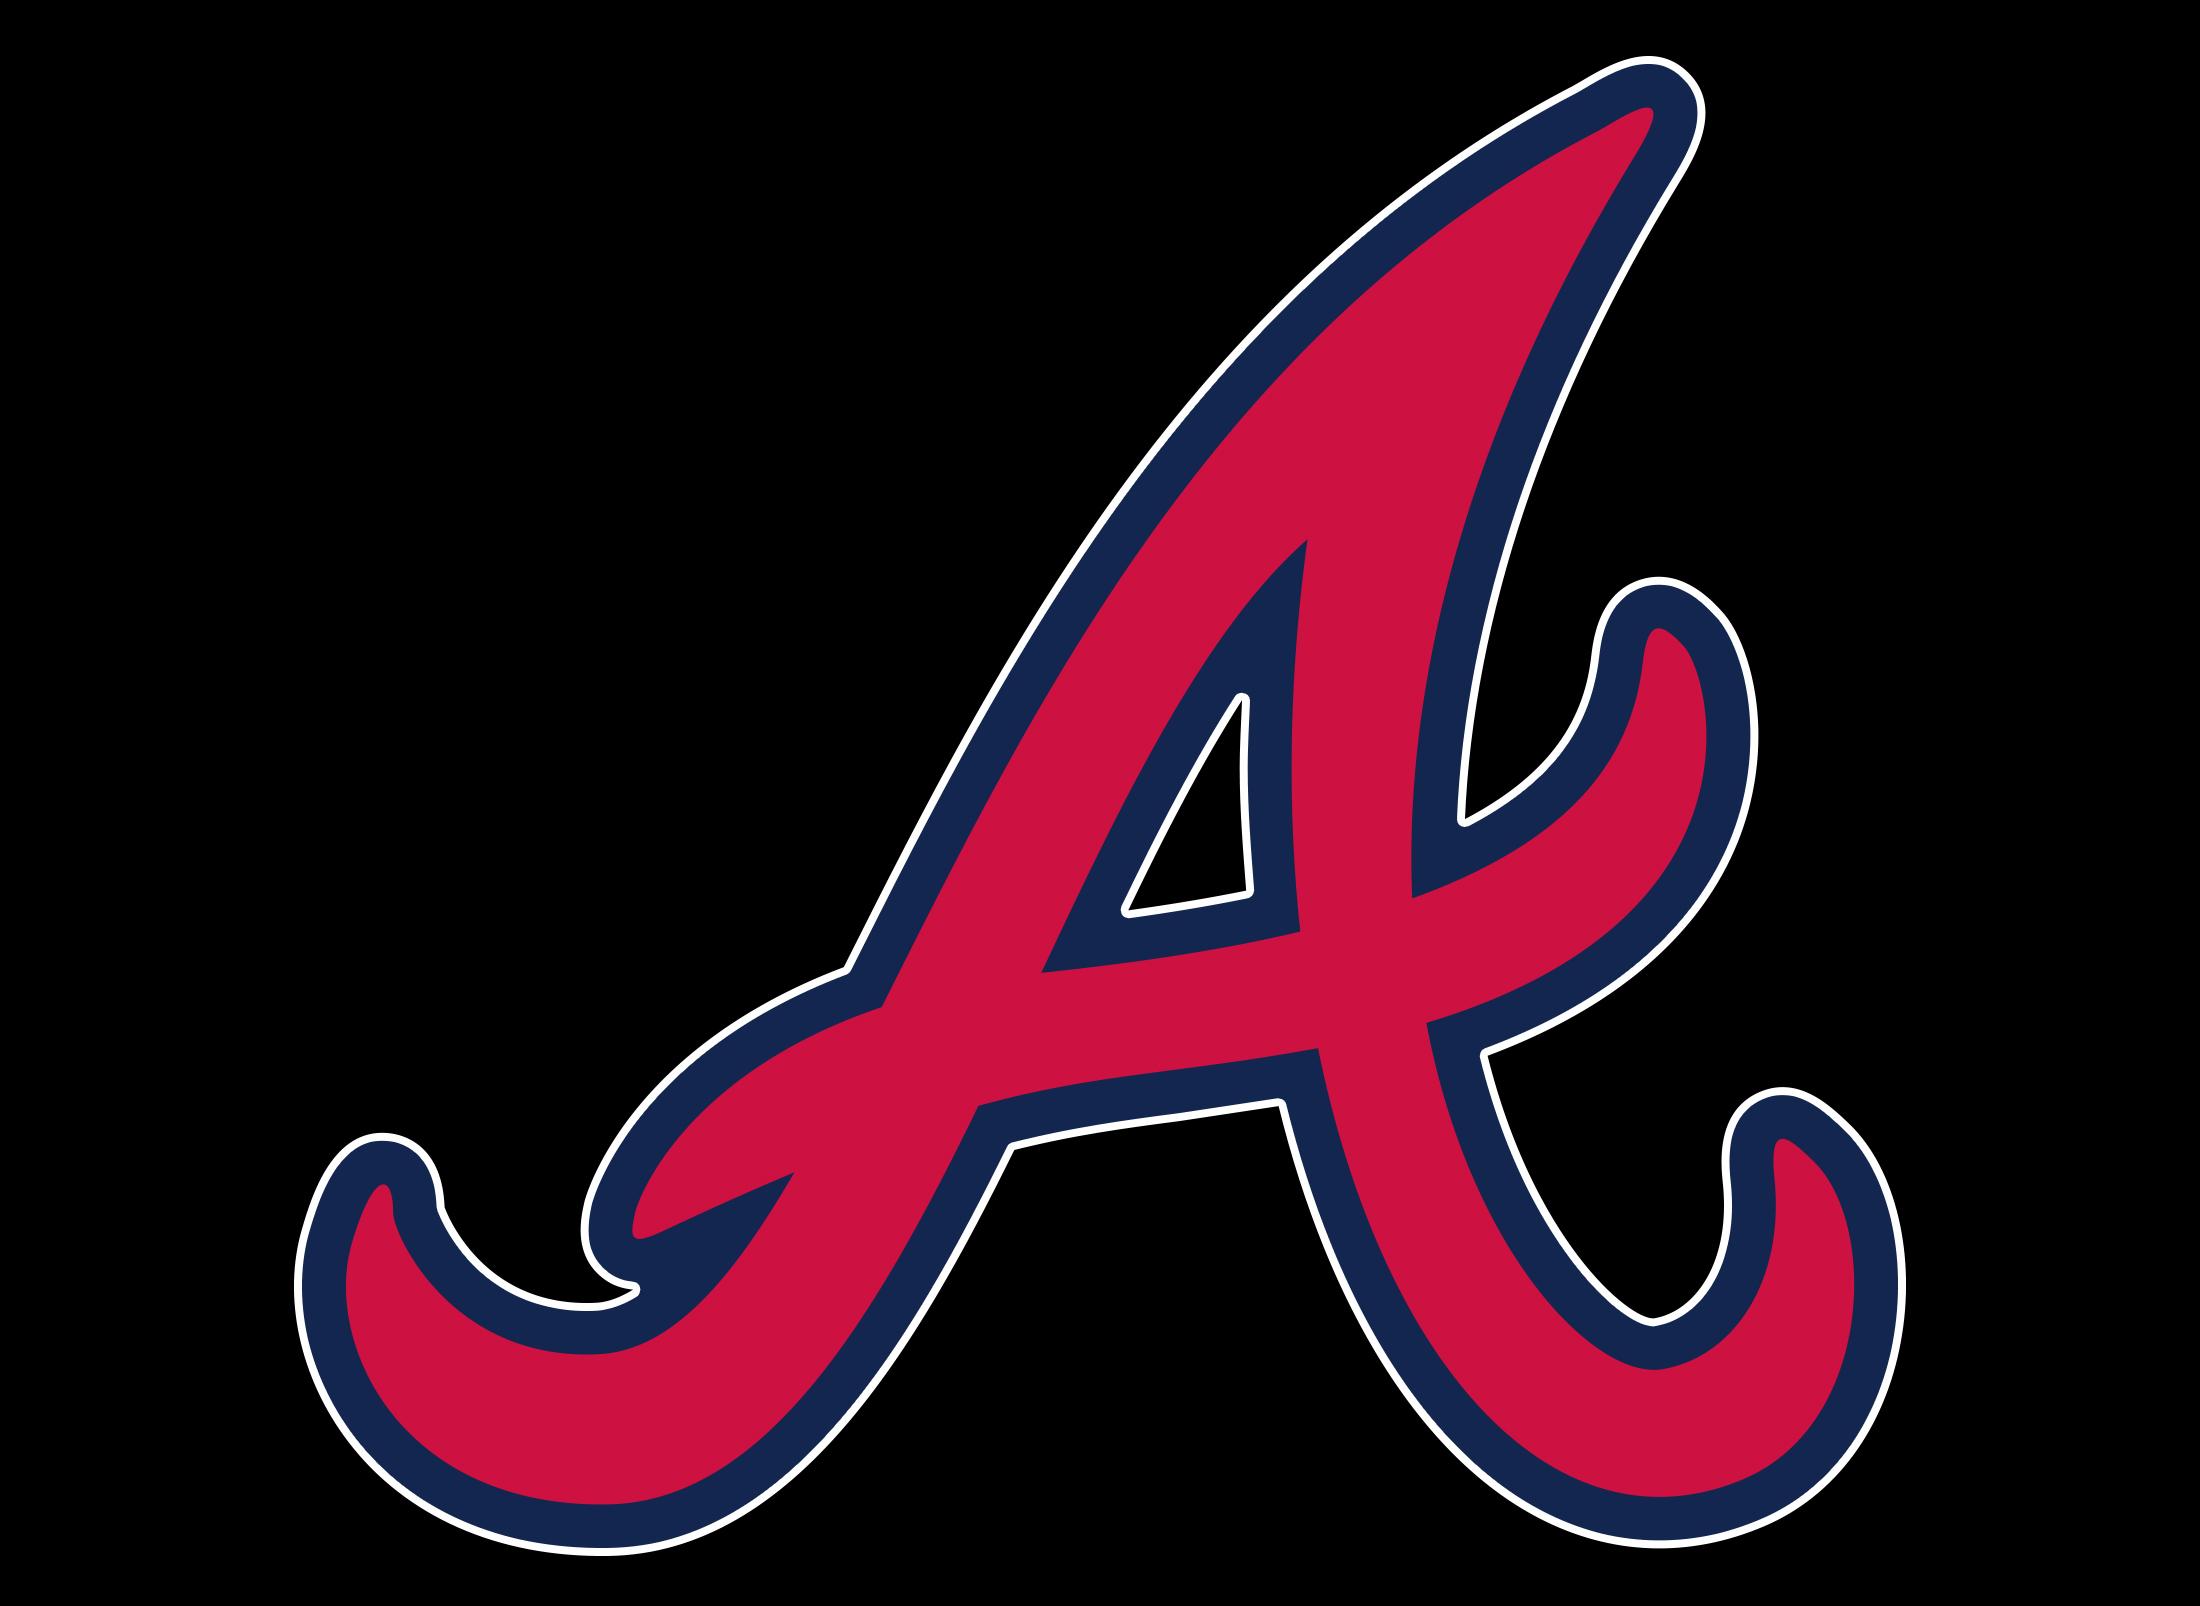 atlanta braves logo  atlanta braves symbol  meaning Atlanta Braves Logo Black Atlanta Braves New Logo